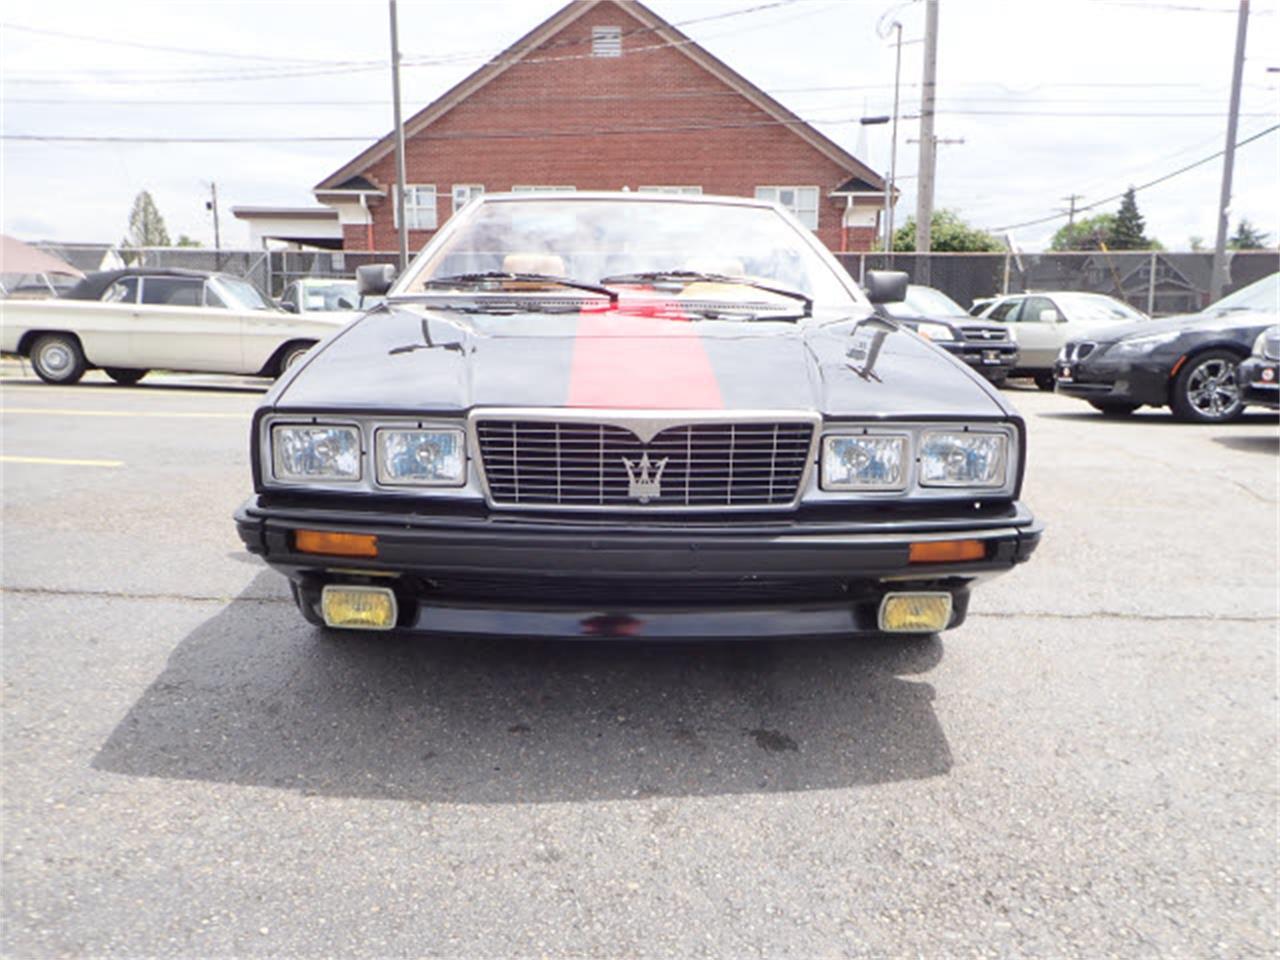 1986 Maserati Spyder (CC-1184561) for sale in Tacoma, Washington